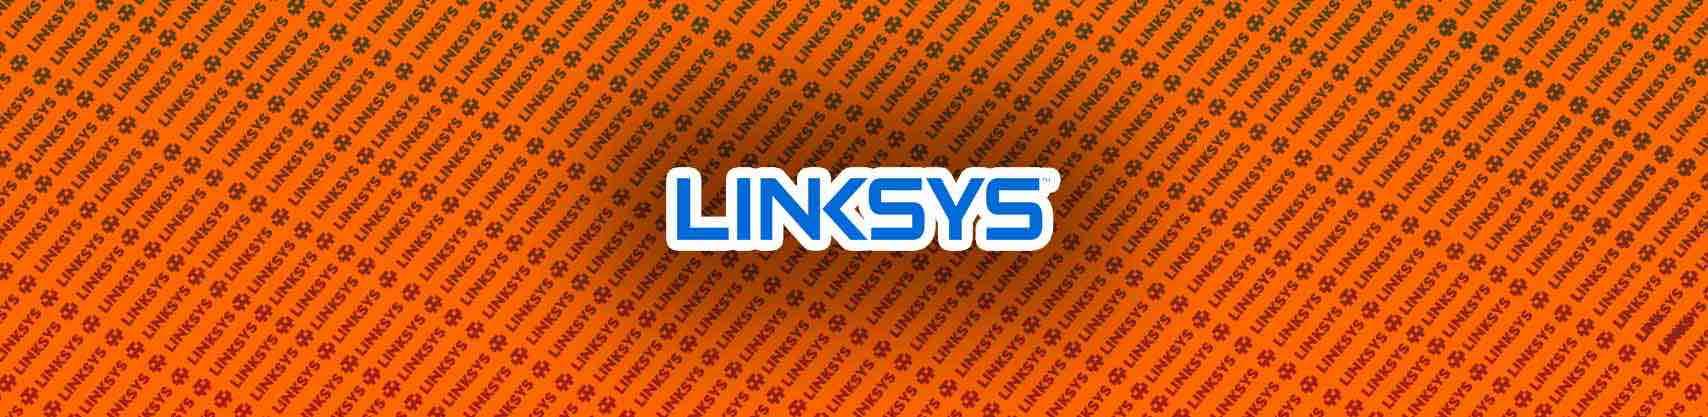 Linksys RE7000 Manual